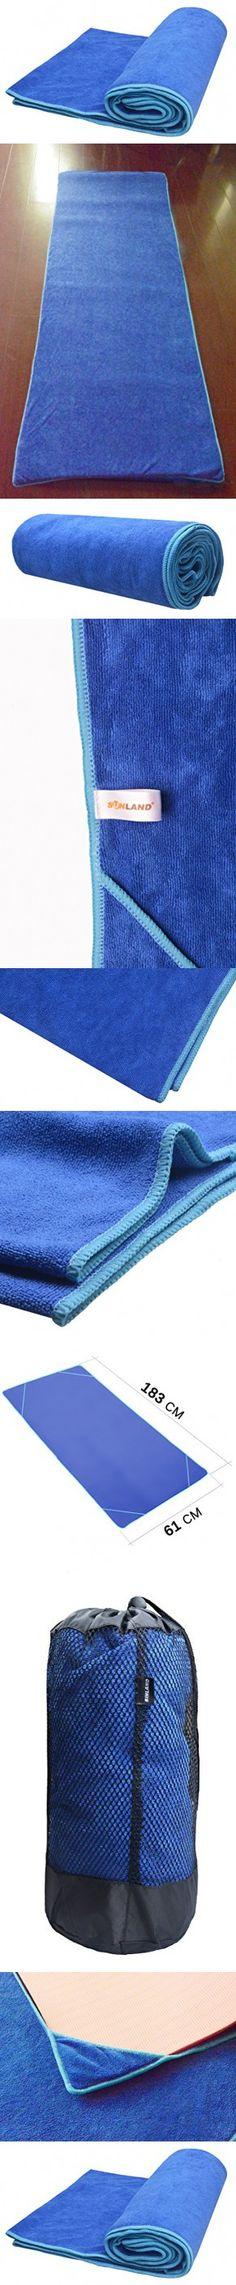 "Sunland Yoga Towel - (24""x72"") - Microfiber Hot Yoga Towel- Perfect for Bikram Yoga Towel, Ashtanga Yoga Towel, Hot Yoga Towel - Super Absorbant, Non Slip, Light, Quick-dry, Eco-friendly"